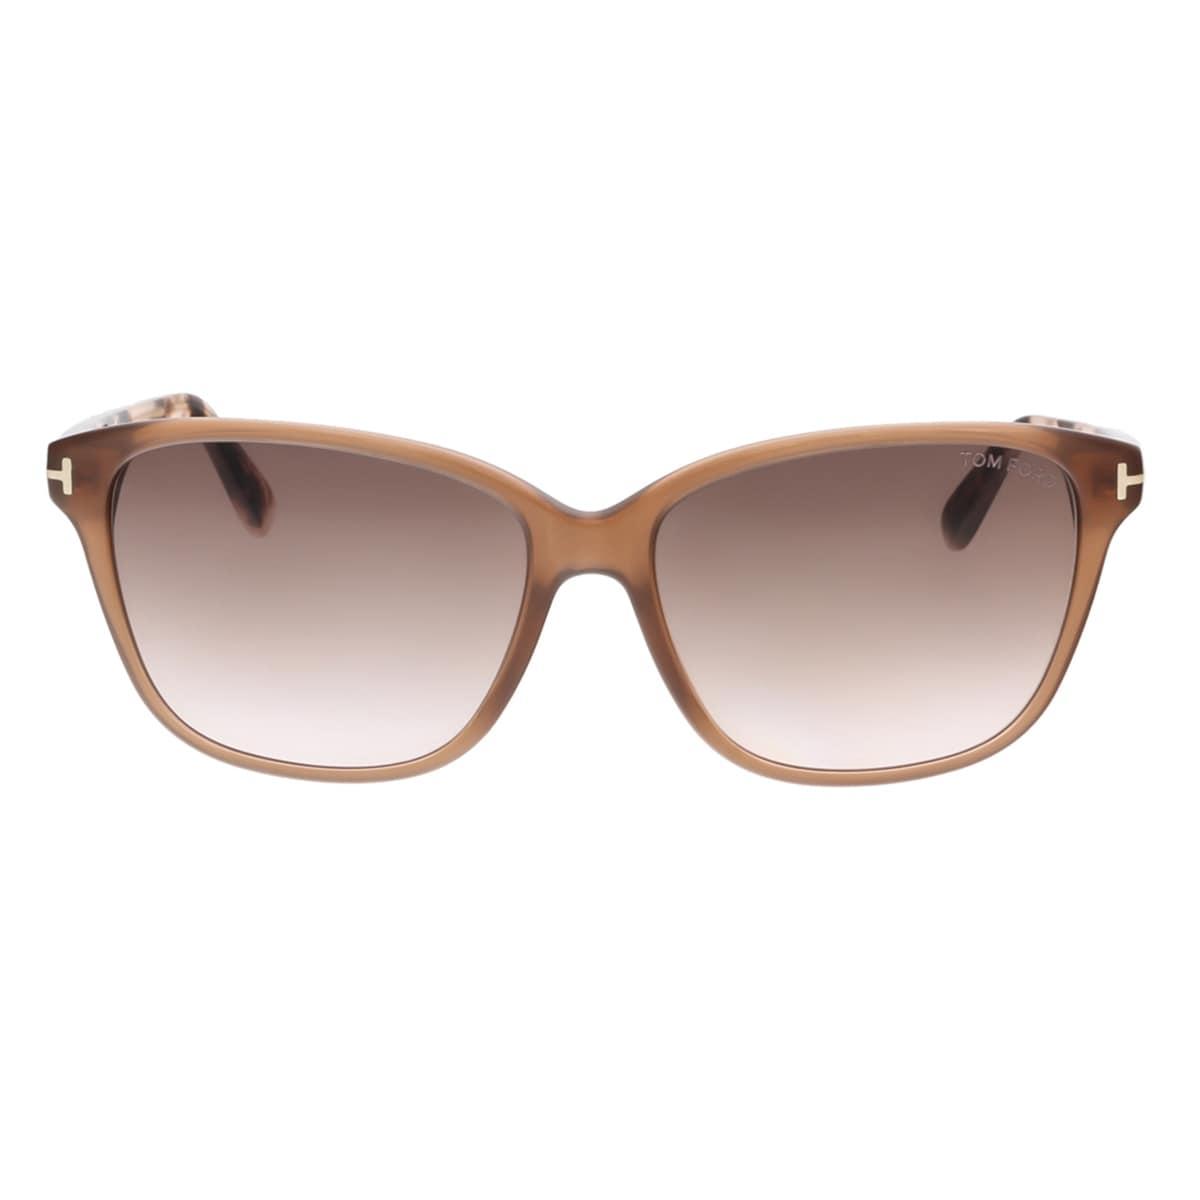 e512b0d587a4e Shop Tom Ford FT0432 45F DANA Brown Rectangular Sunglasses - 59-15-140 -  Free Shipping Today - Overstock - 15408947